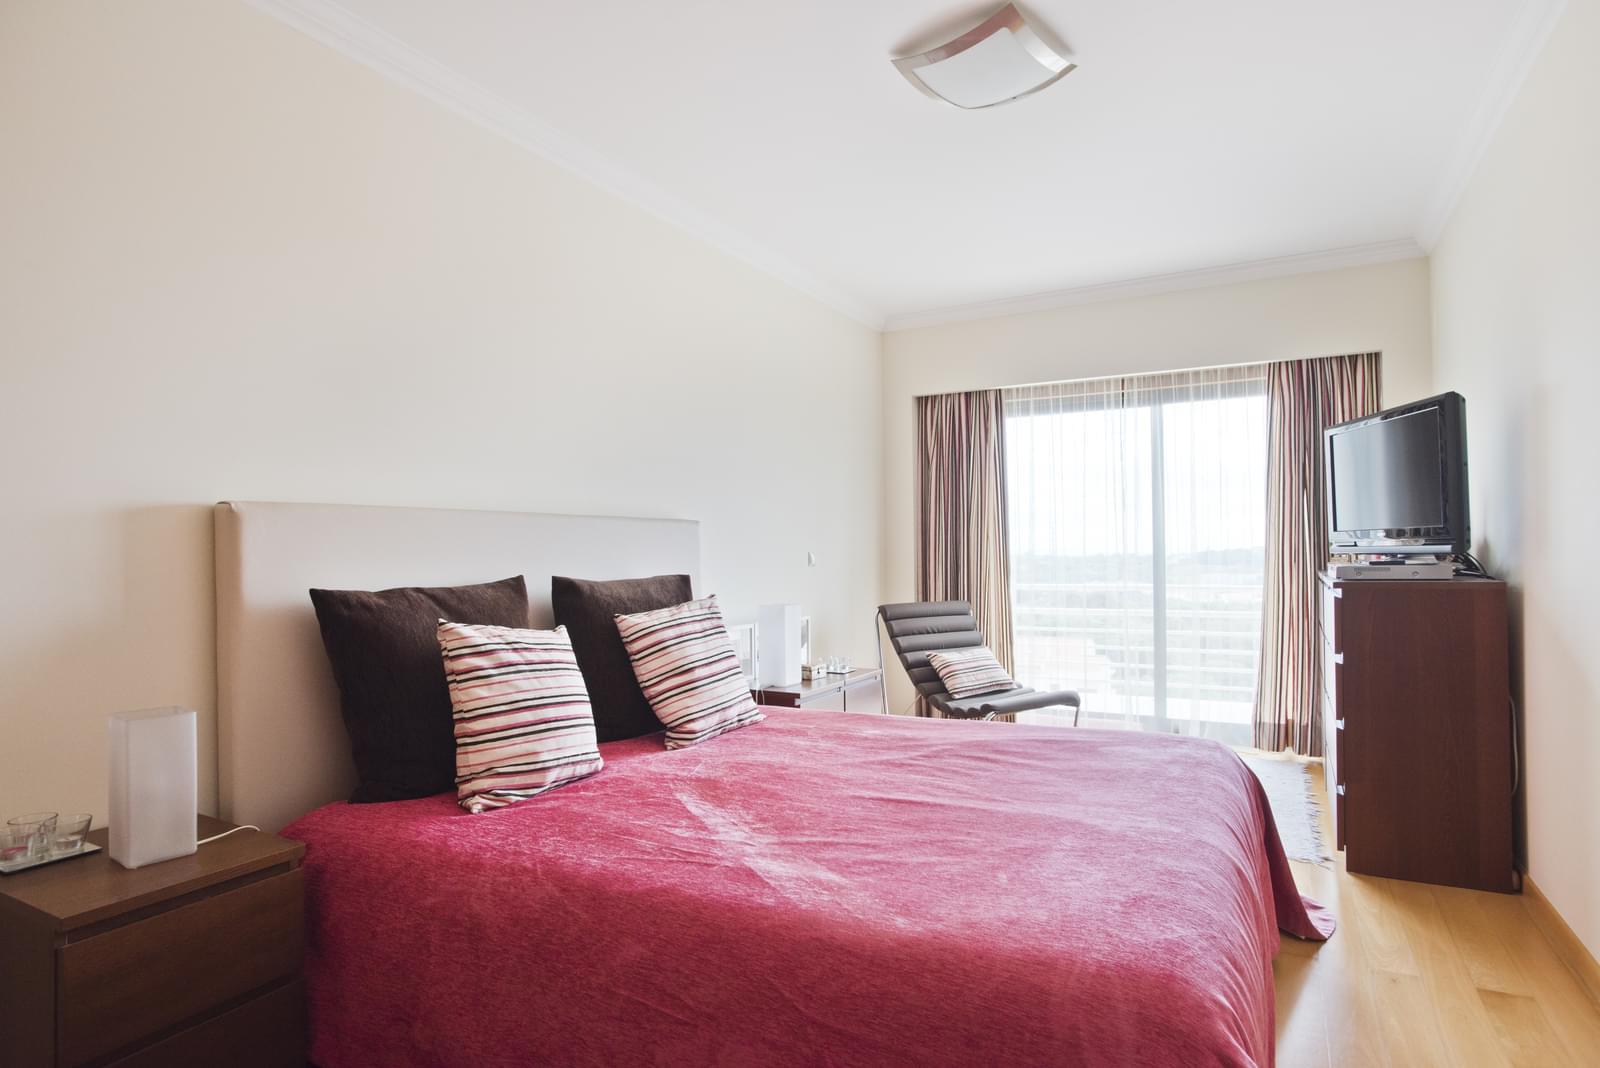 pf17004-apartamento-t3-cascais-790f7b71-68e0-4f95-8b6a-c9d5e12ad8e9